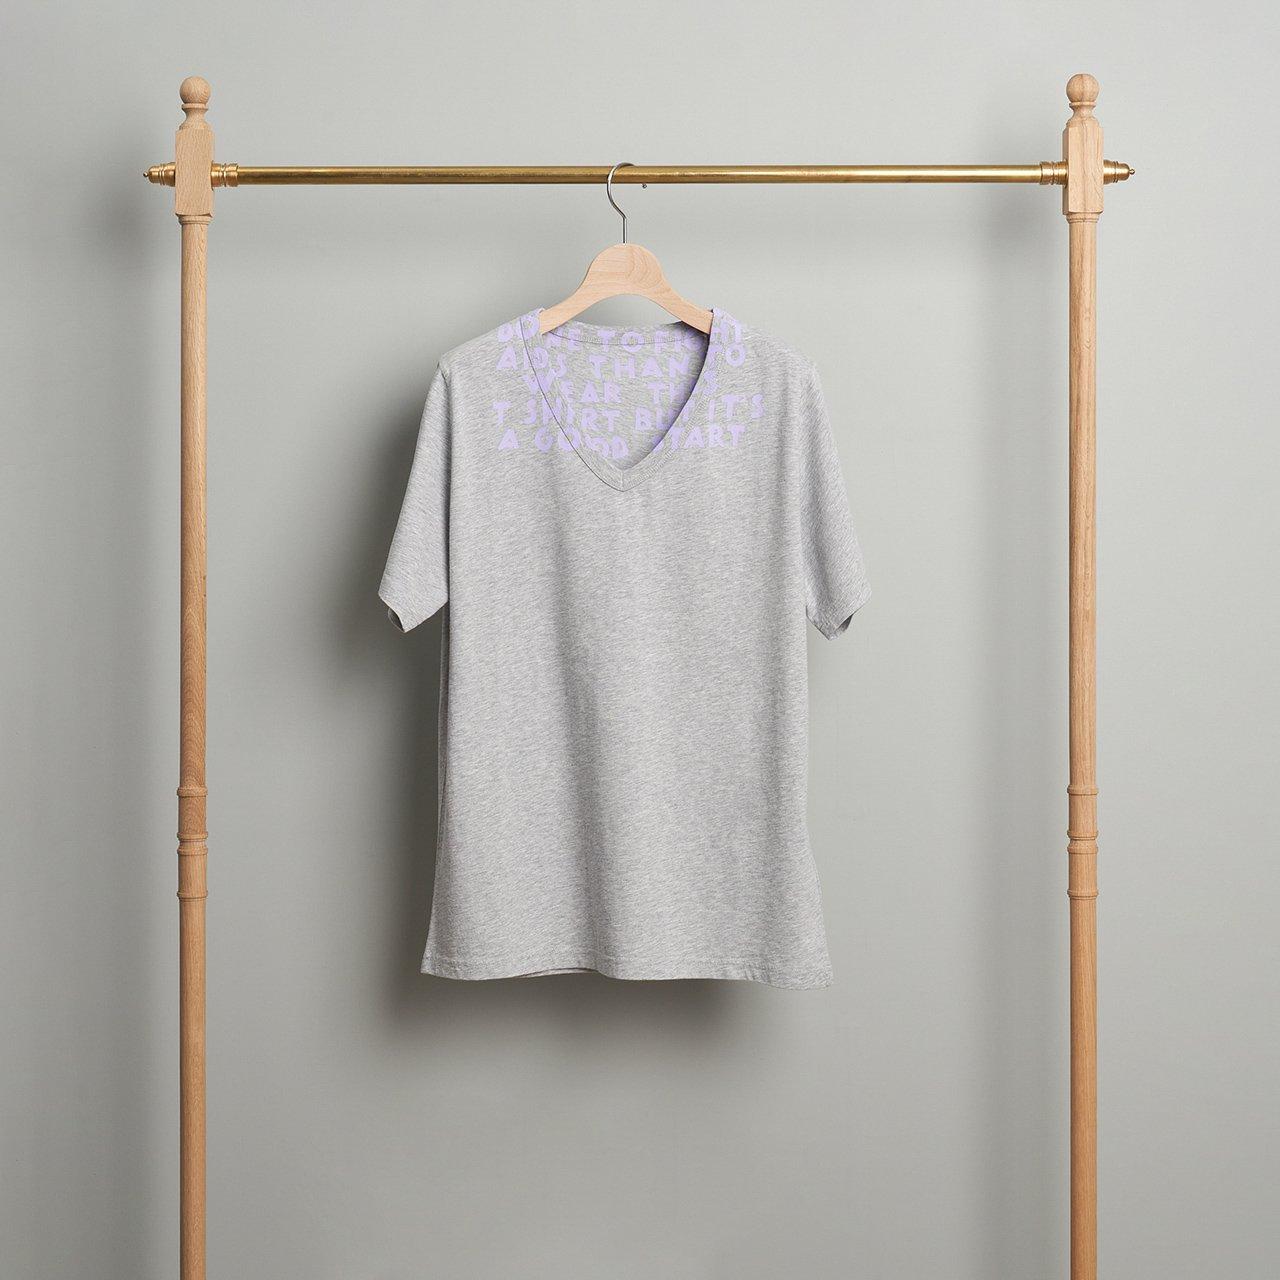 Maison Margiela PARIS <BR>VネックTシャツ<BR>